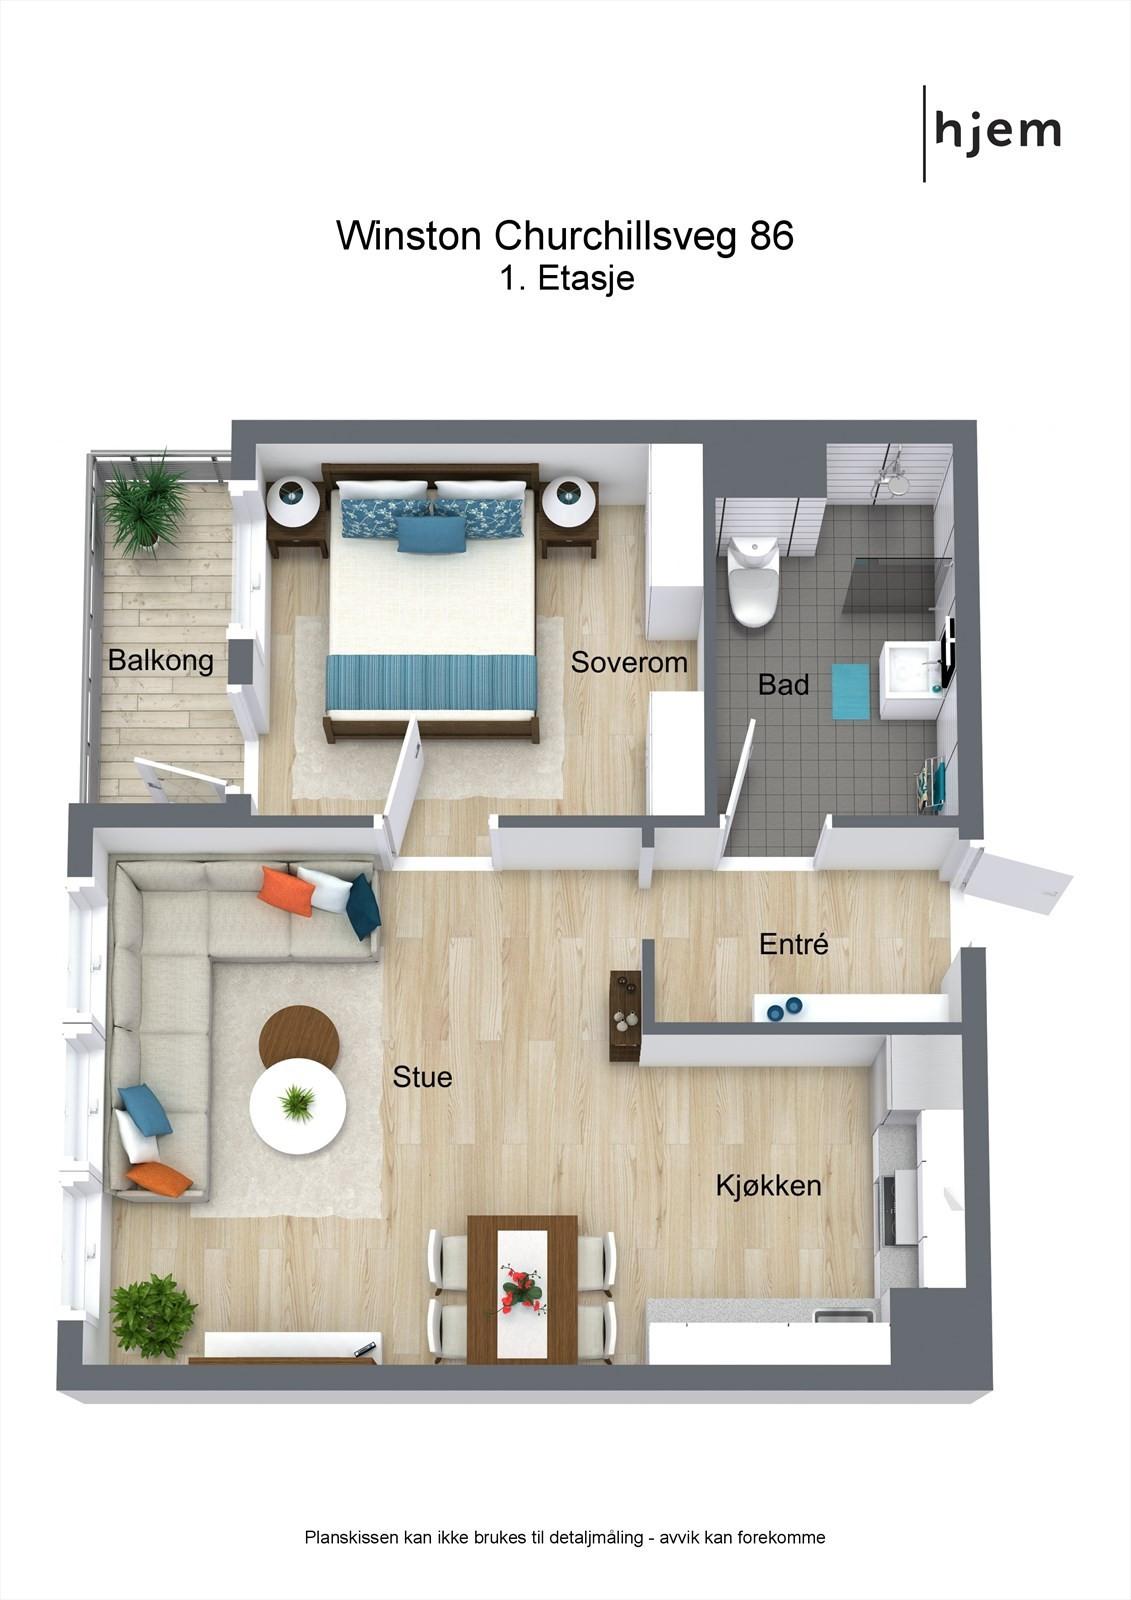 Floorplan letterhead - Winston Churchillsveg 86 - 1. Etasje - 3D Floor Plan.jpg